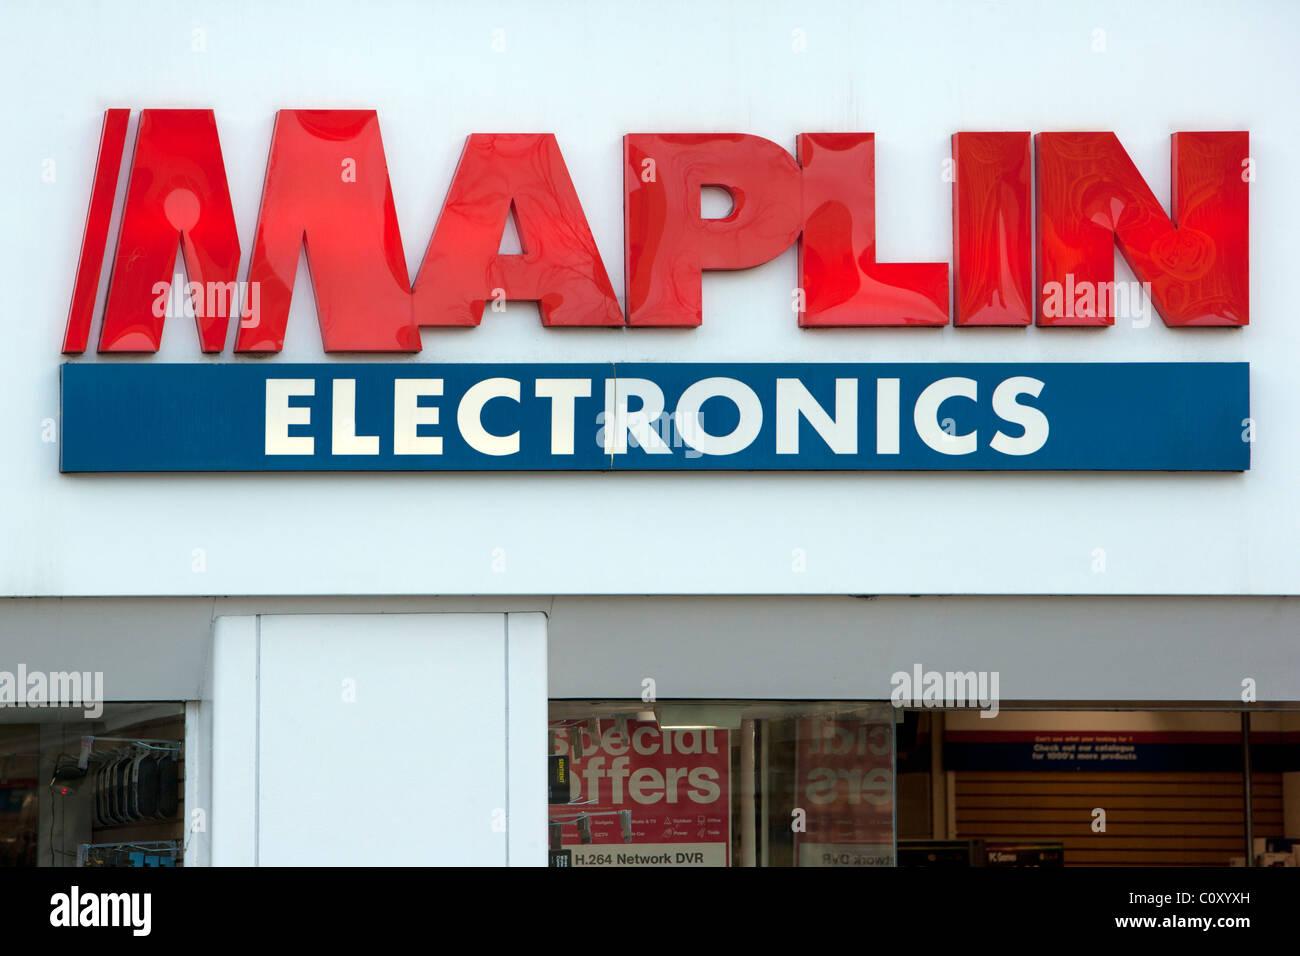 Maplin Electronics sign and logo - Stock Image